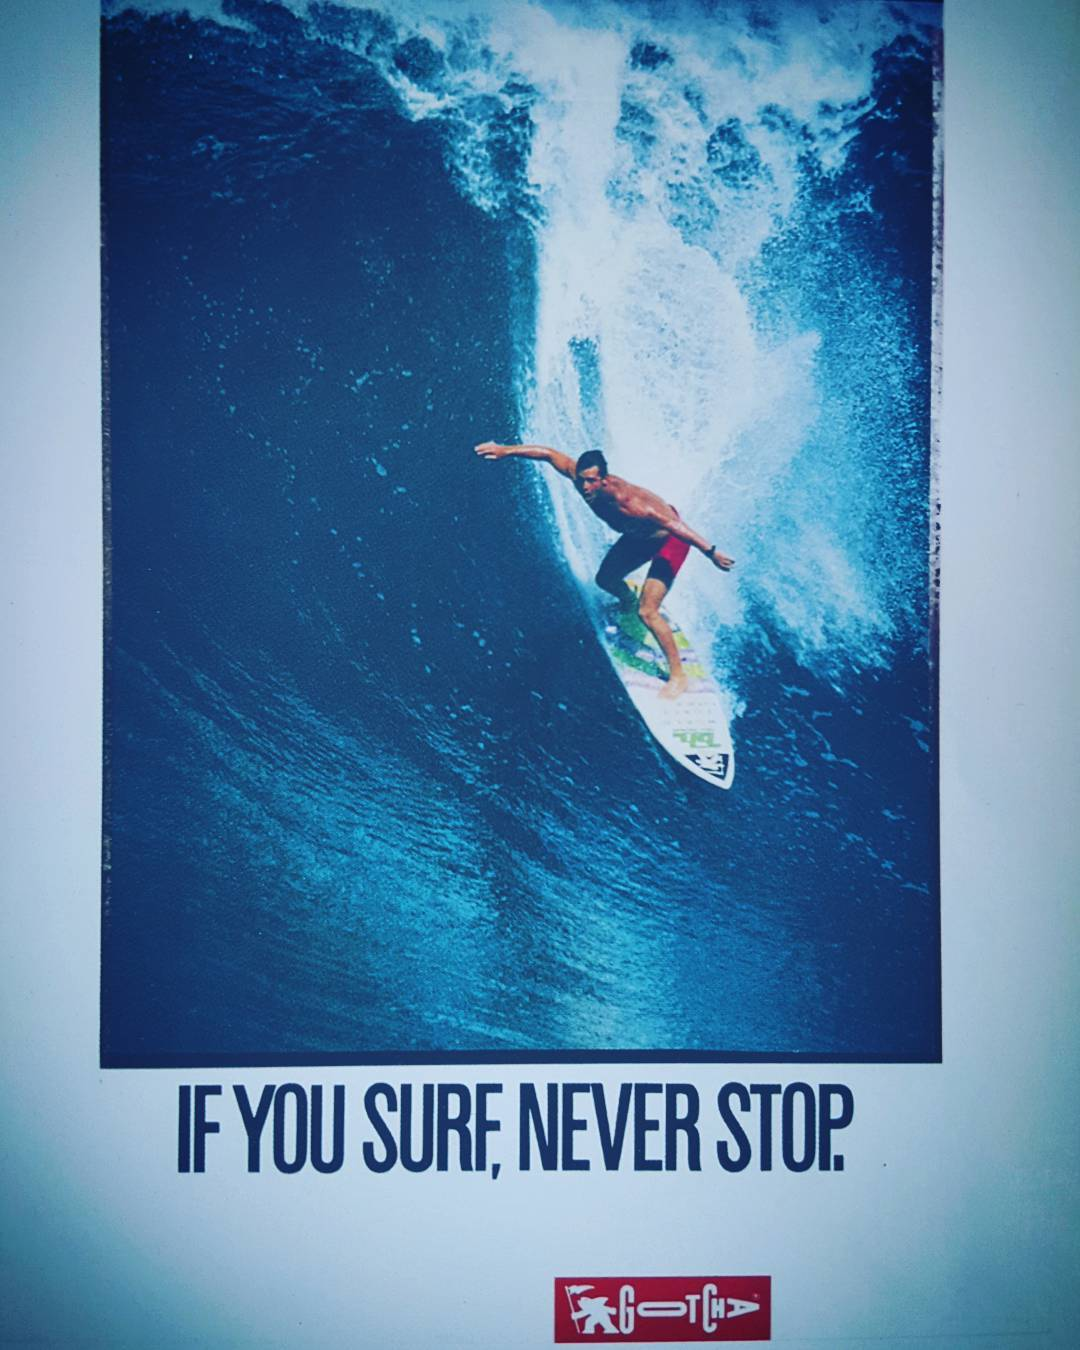 IF YOU SURF, NEVER STOP #gotcha